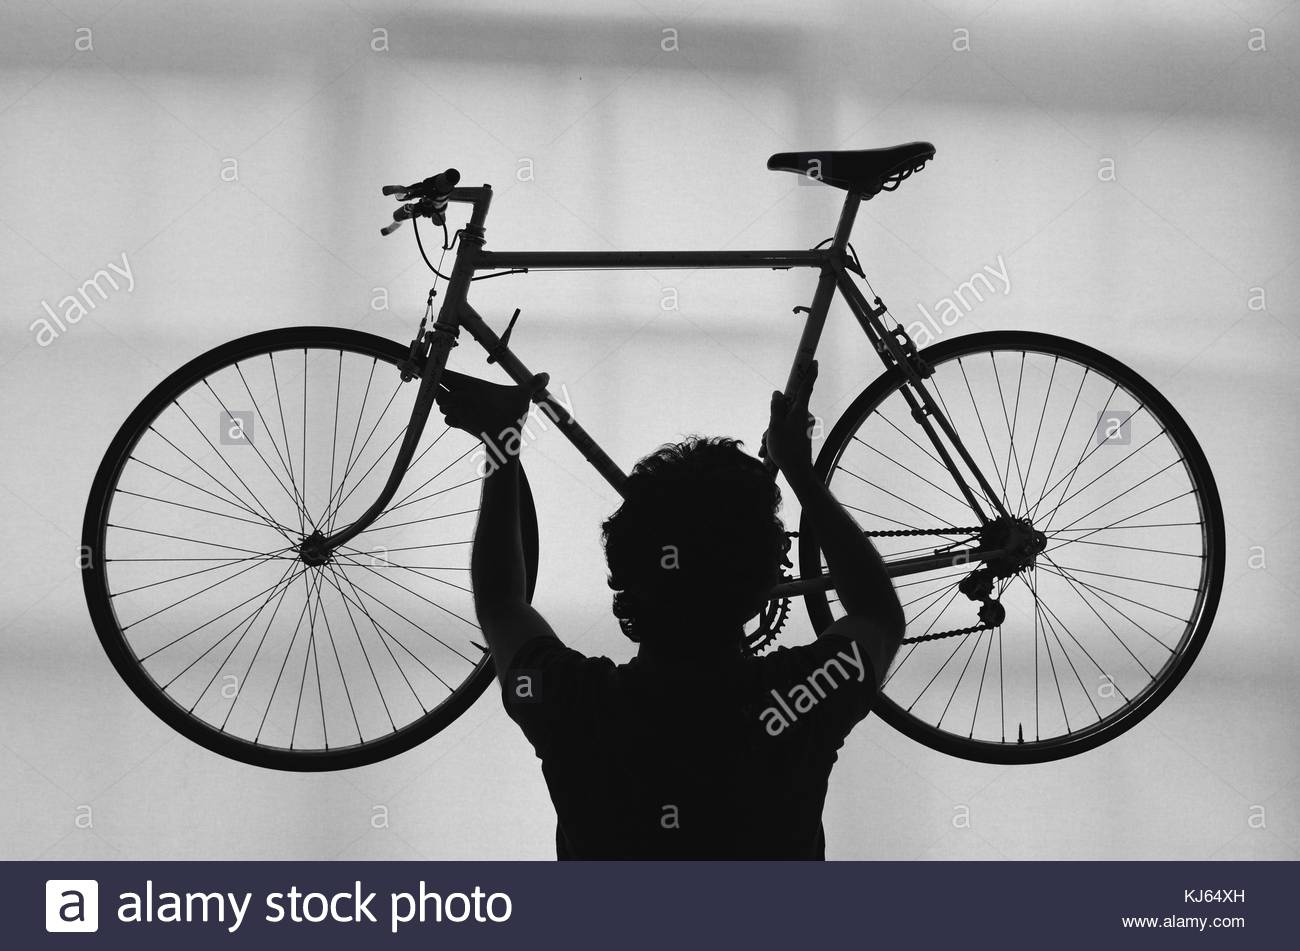 Silueta de hombre sujetando una bicicleta Imagen De Stock